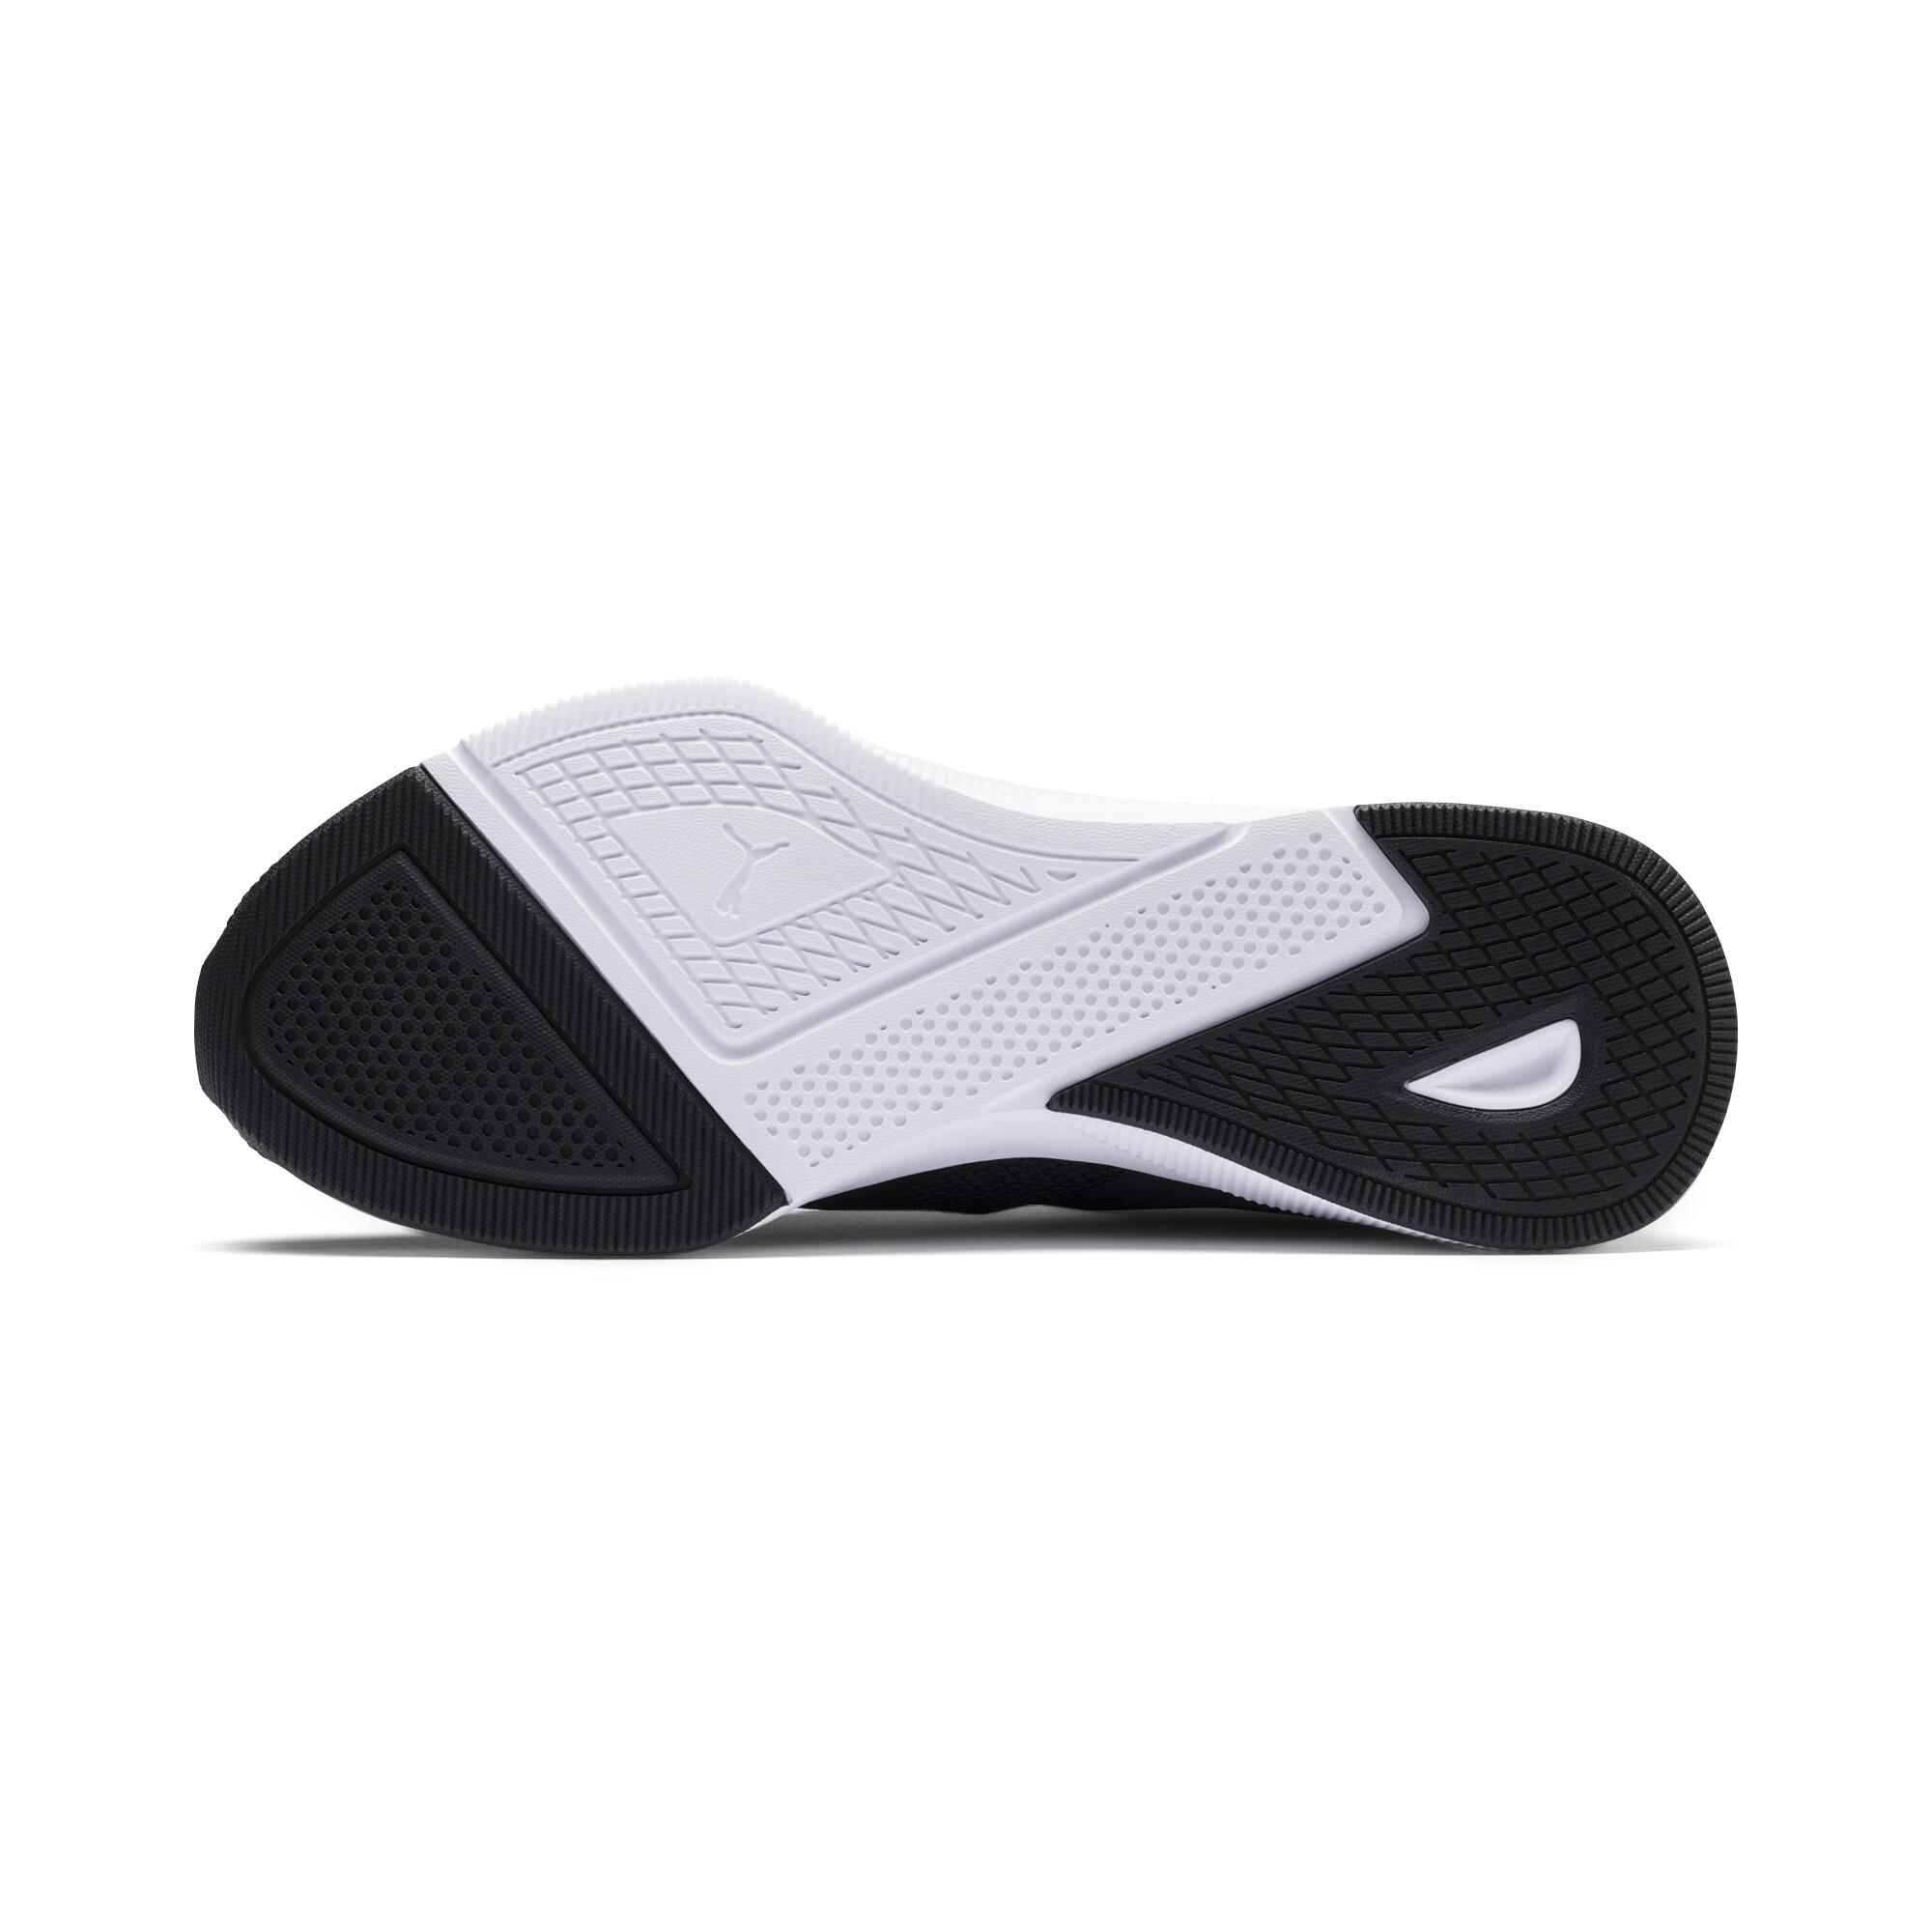 PUMA-Flyer-Runner-Running-Shoes-Mens-Shoe-Running thumbnail 5